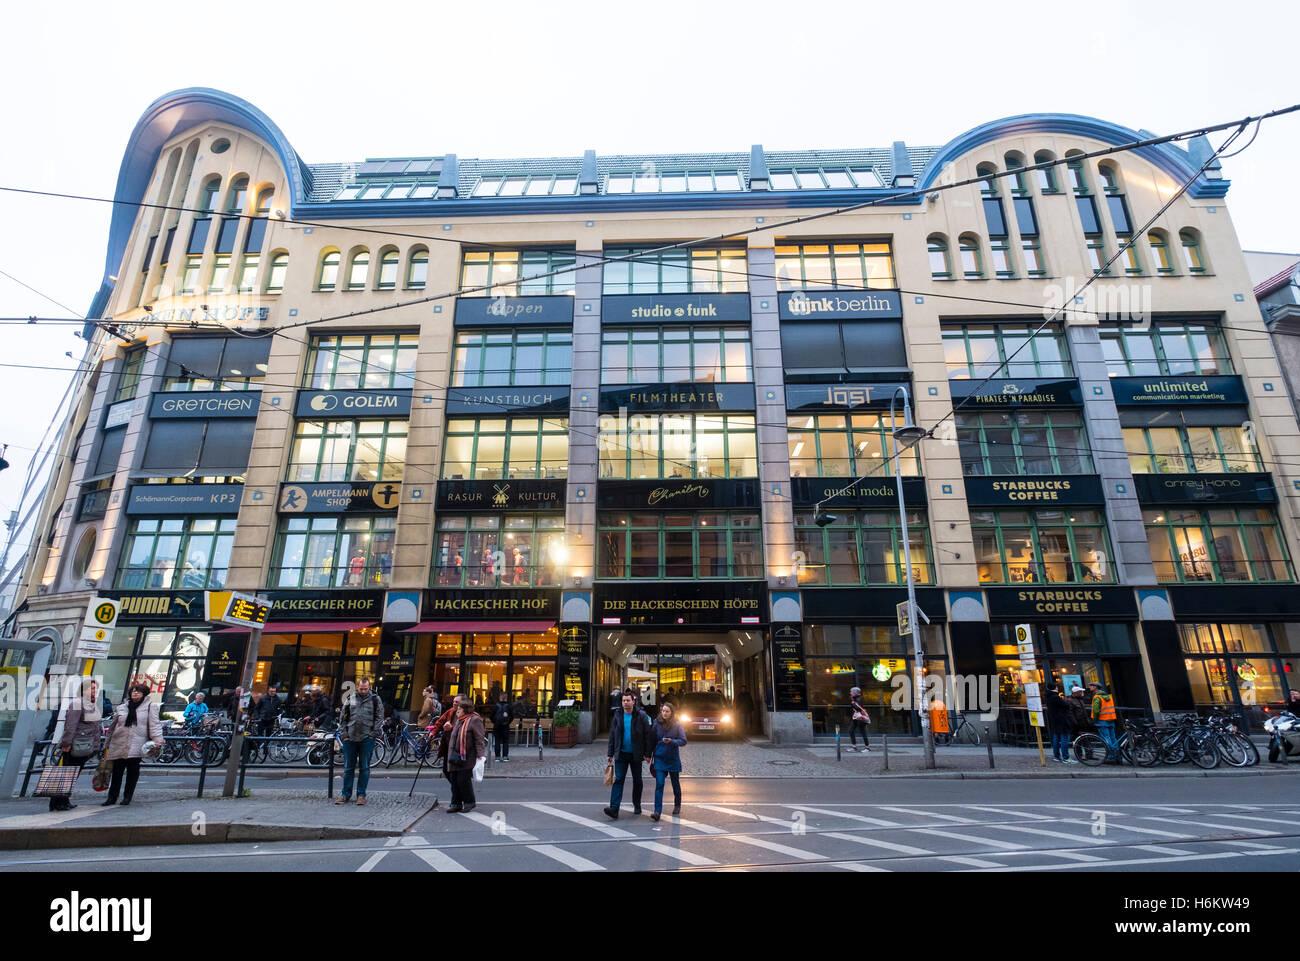 View of Hackescher Hof, historic retail and culture development in Mitte Berlin Germany - Stock Image